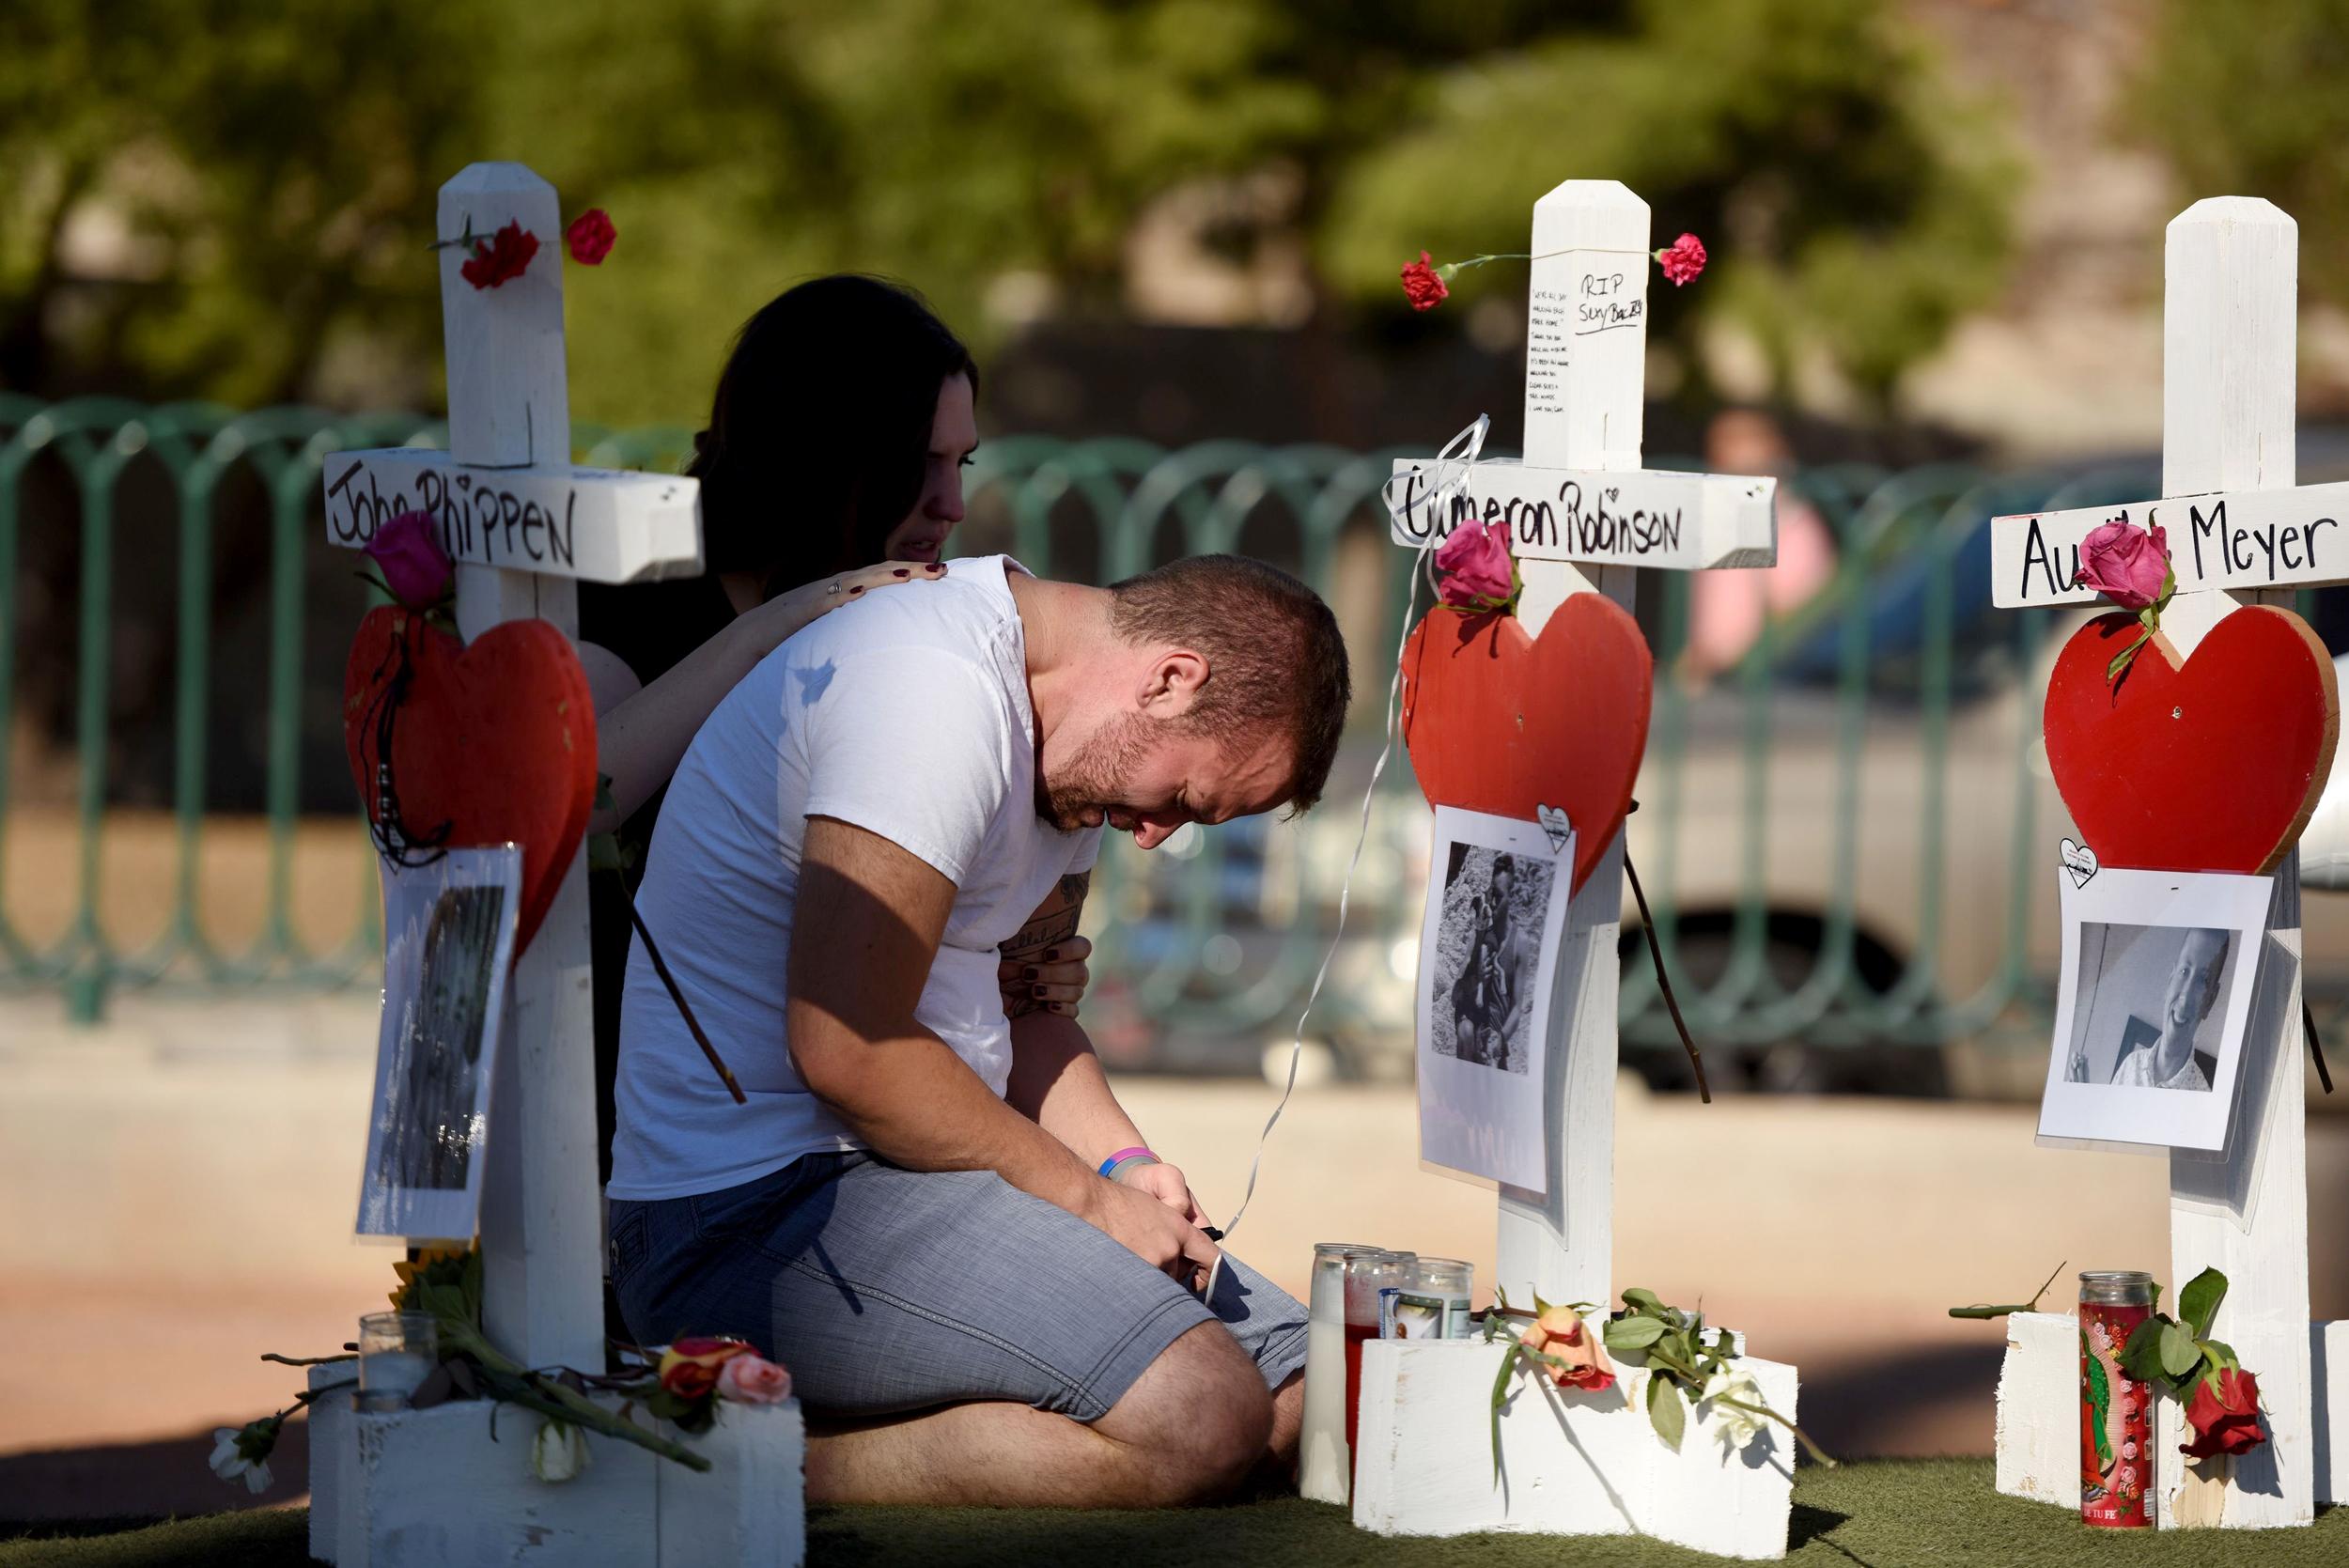 Image: Ethan Avanzino grieves beside a white cross